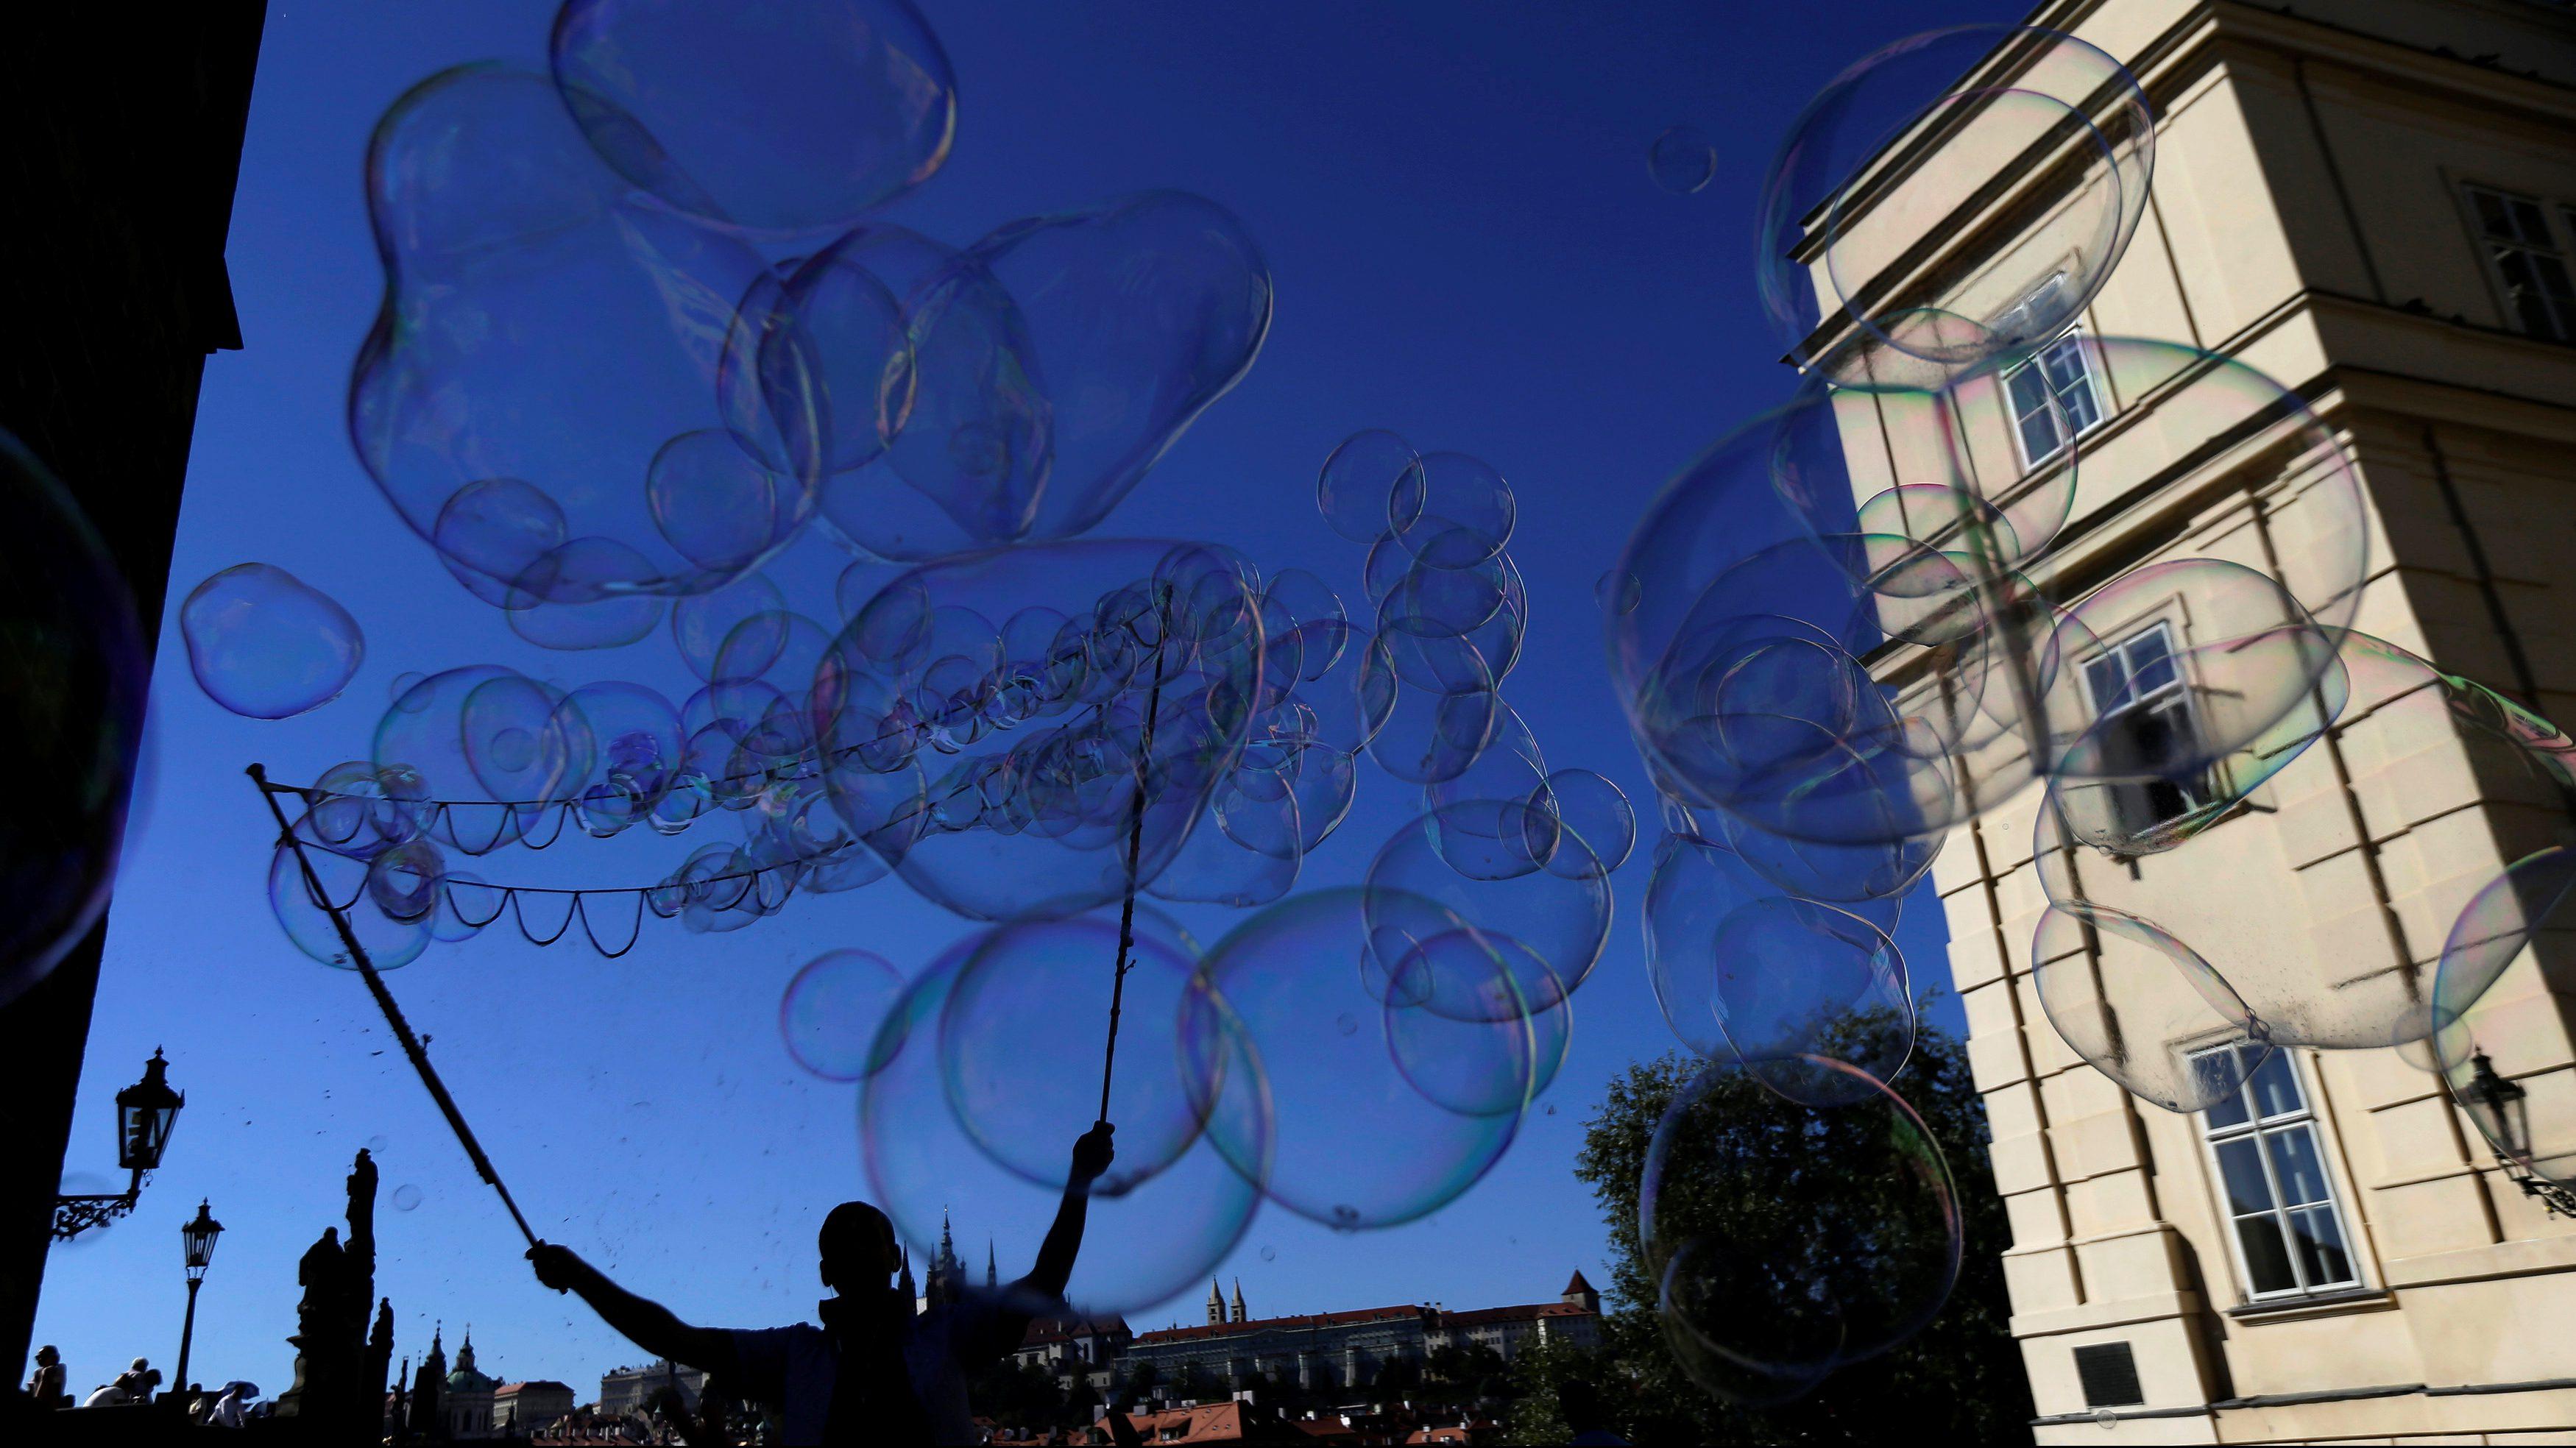 A street artist performs with soap bubbles in Prague, Czech Republic August 31, 2016.